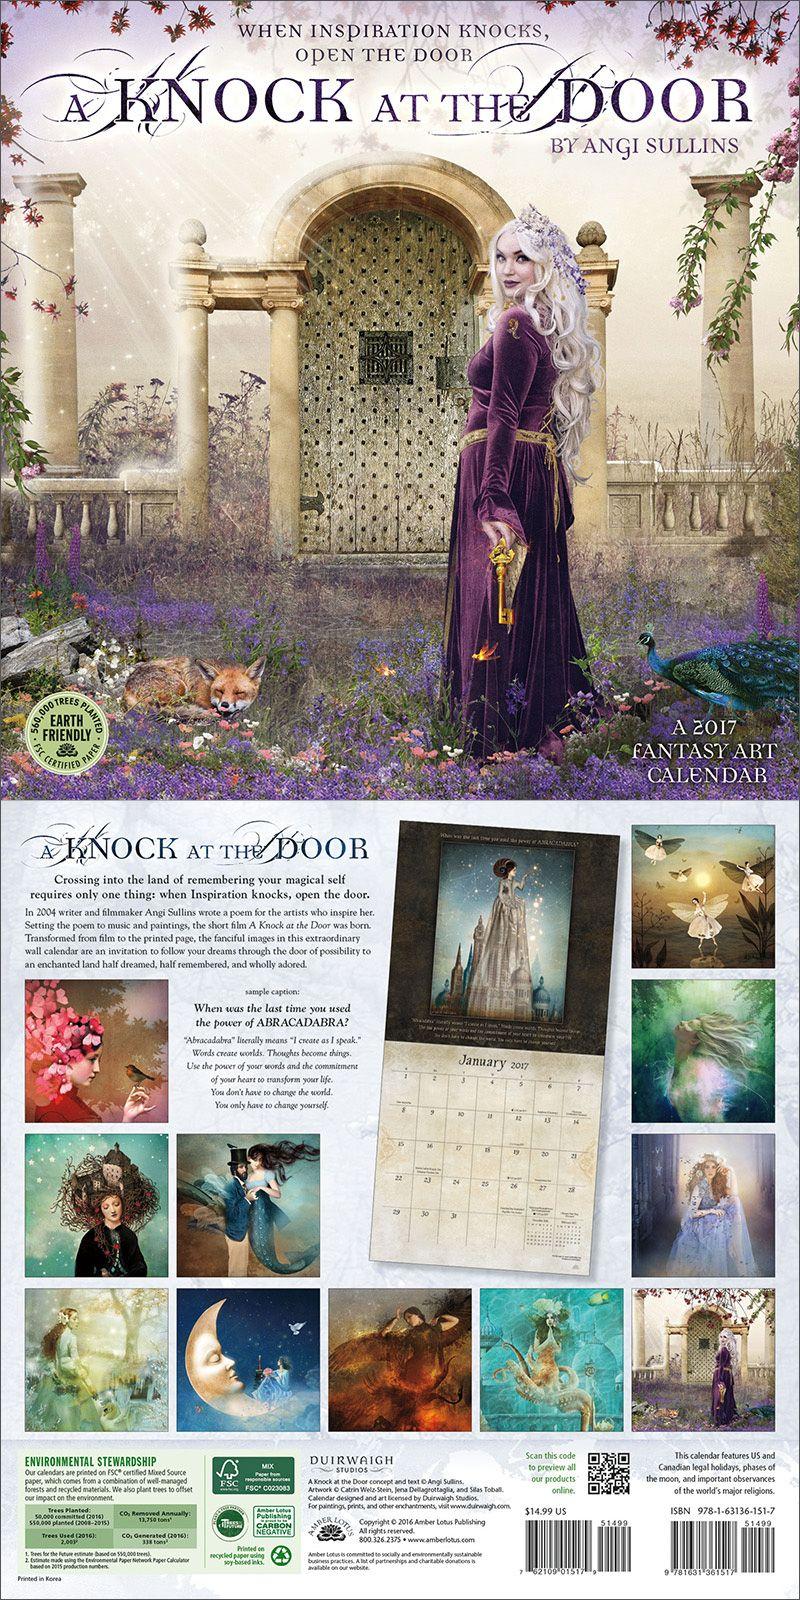 Art Calendar Book : A knock at the door fantasy art wall calendar by angi